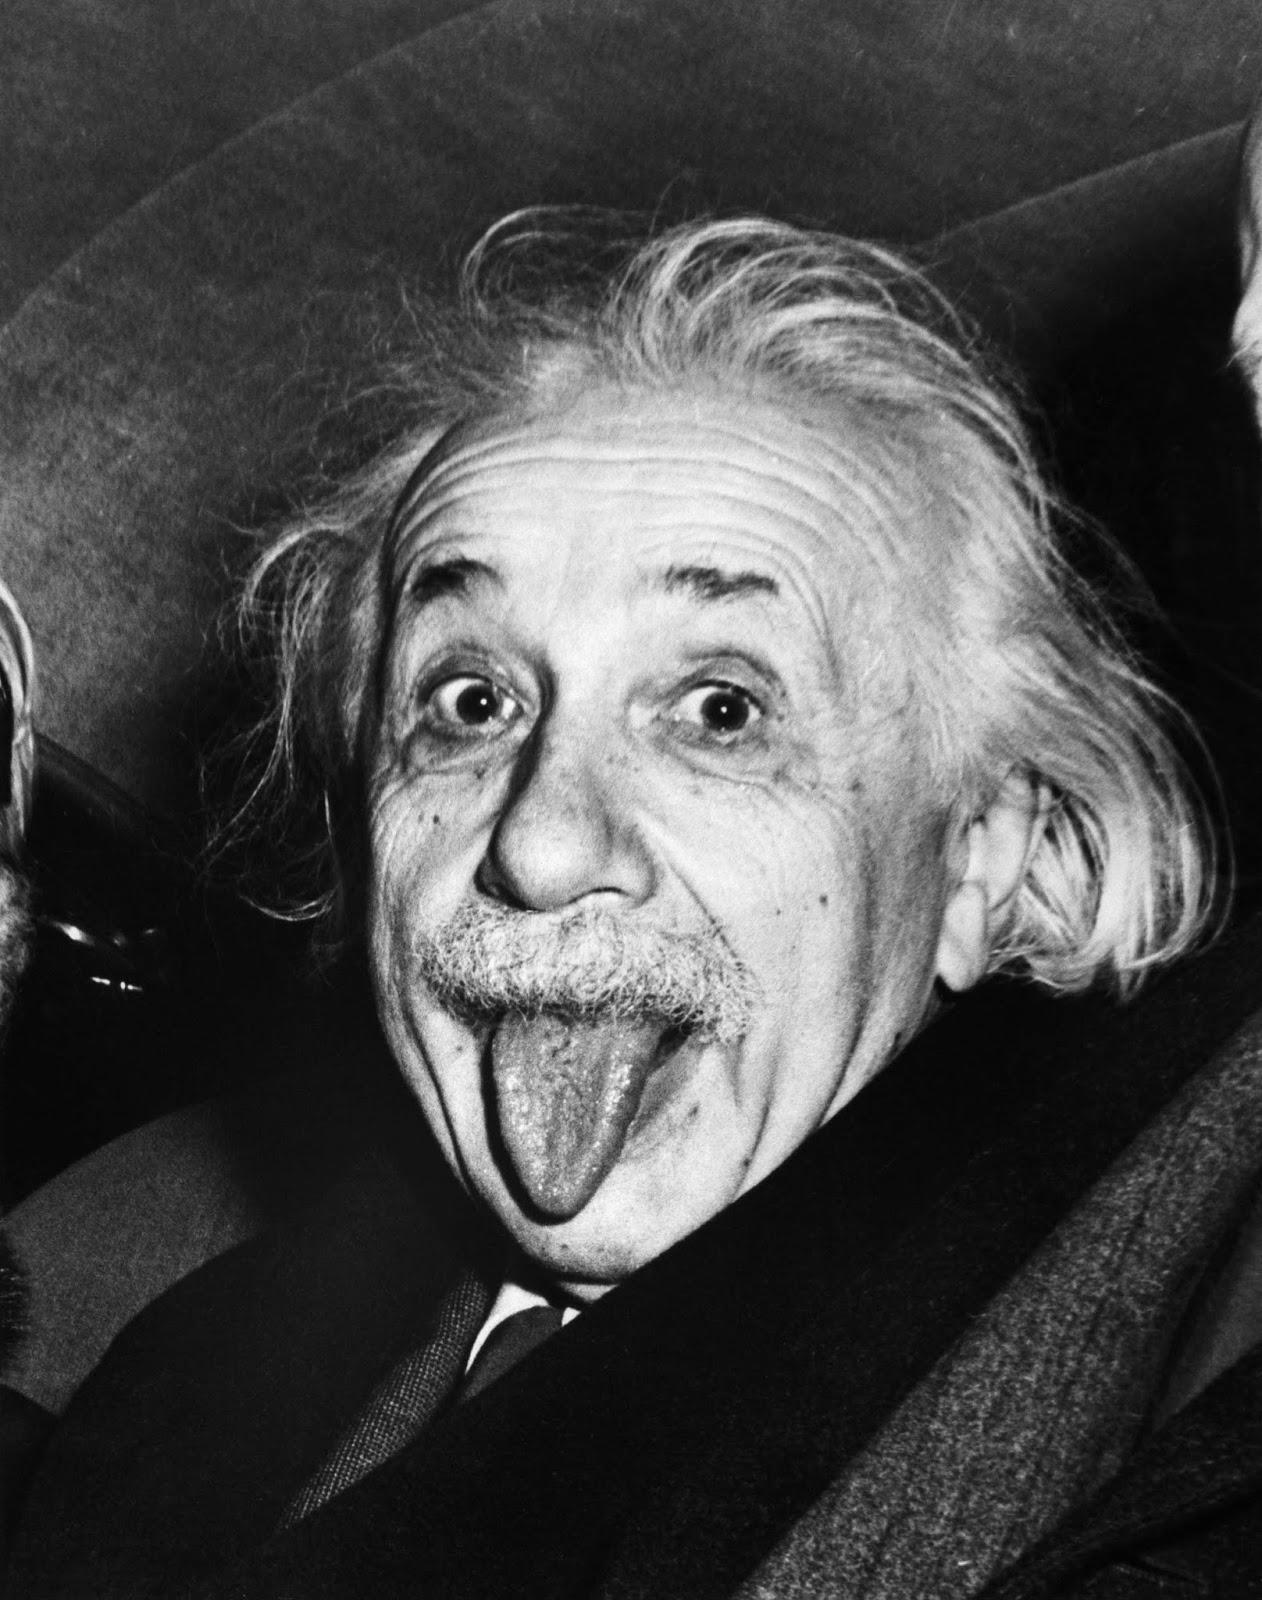 Zamanda Yolculuk Hayalleri Kurduran Dahi Fizikçi; Albert Einstein